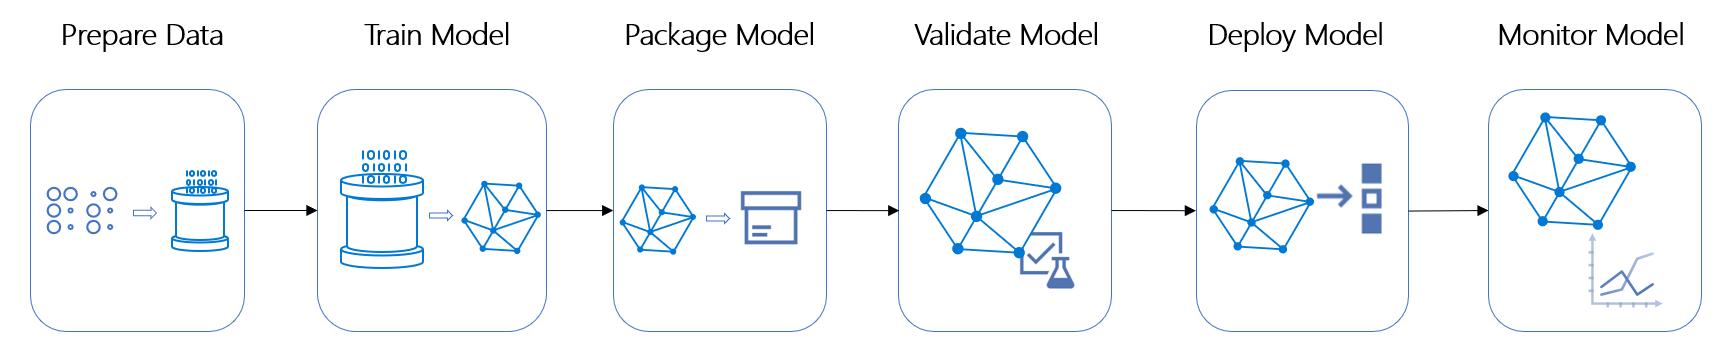 Pipeline di Machine Learning in Azure Machine Learning